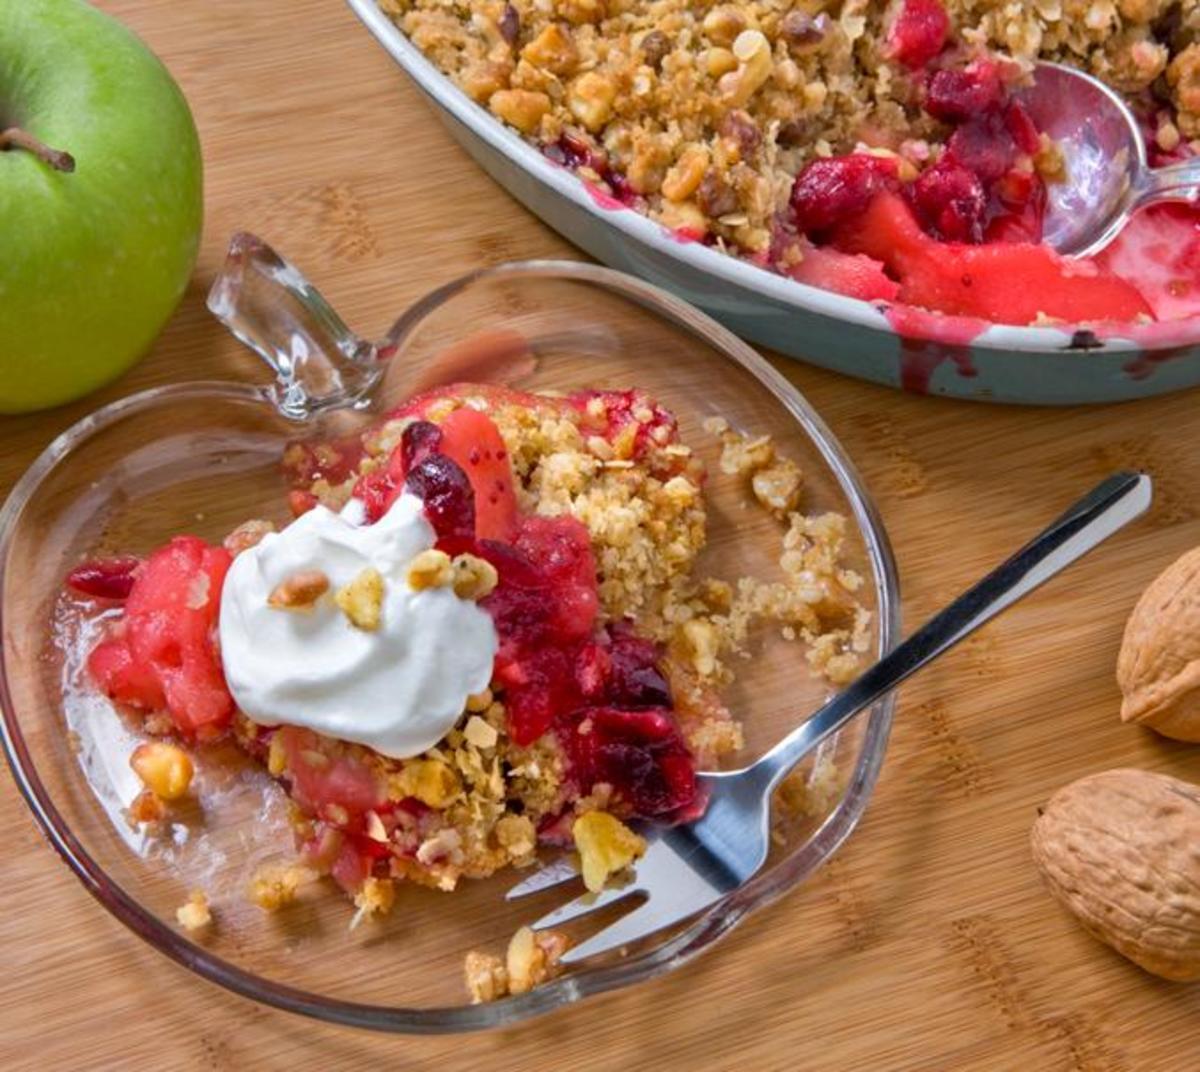 Cranberry Apple Walnut Crumble